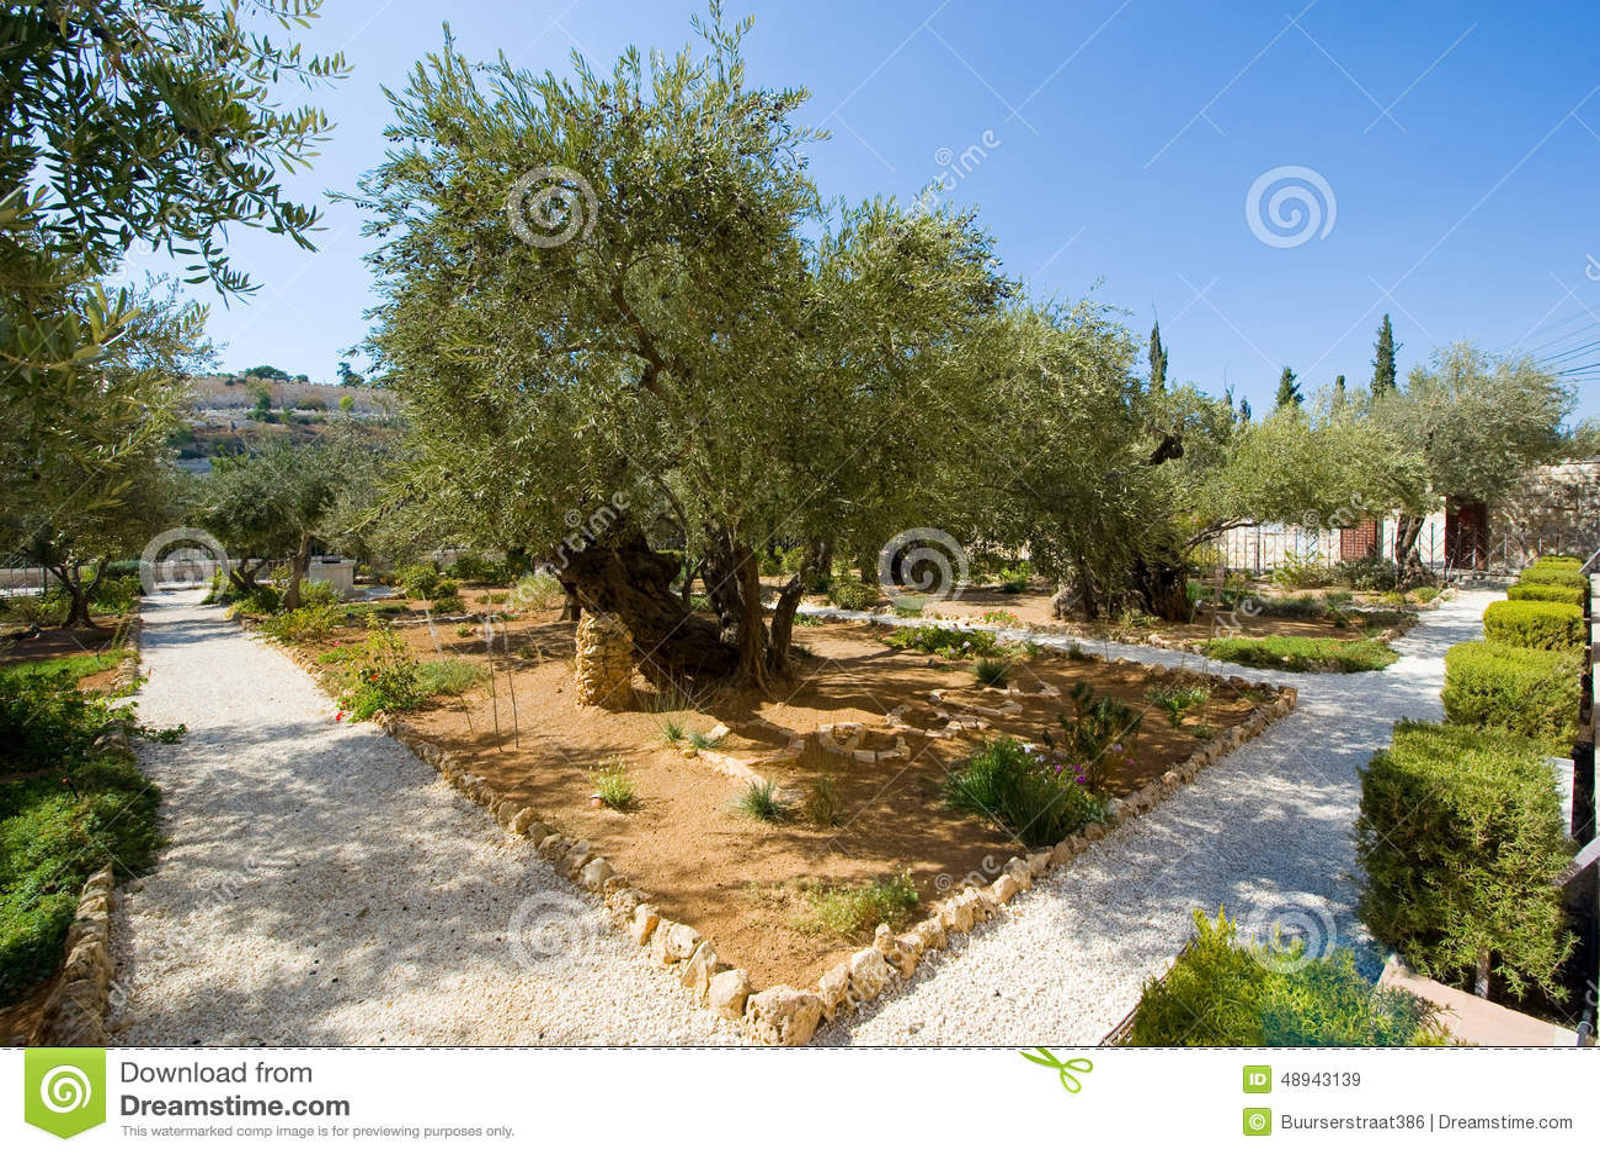 Garden of Gethsemane stock image. Image of apostles, olives - 48943139